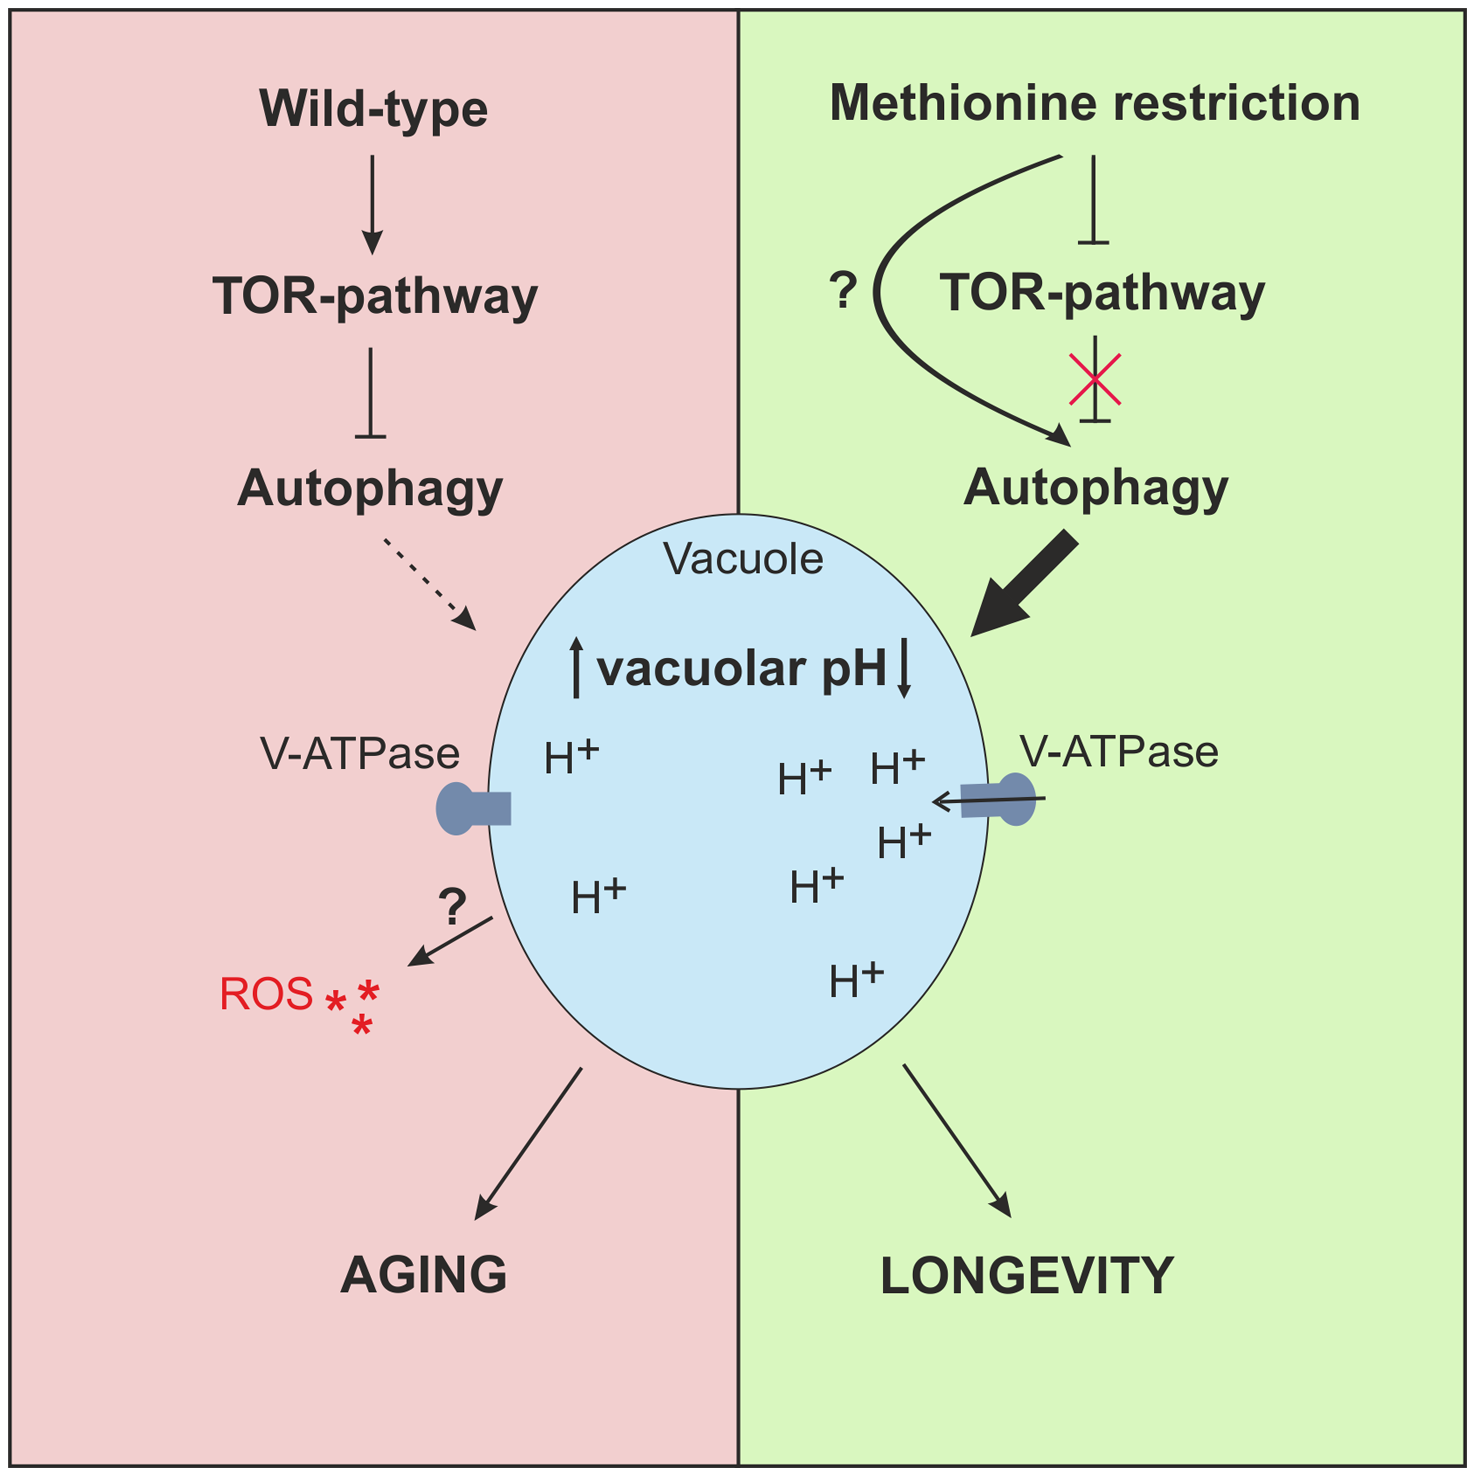 Model of MetR-mediated longevity.